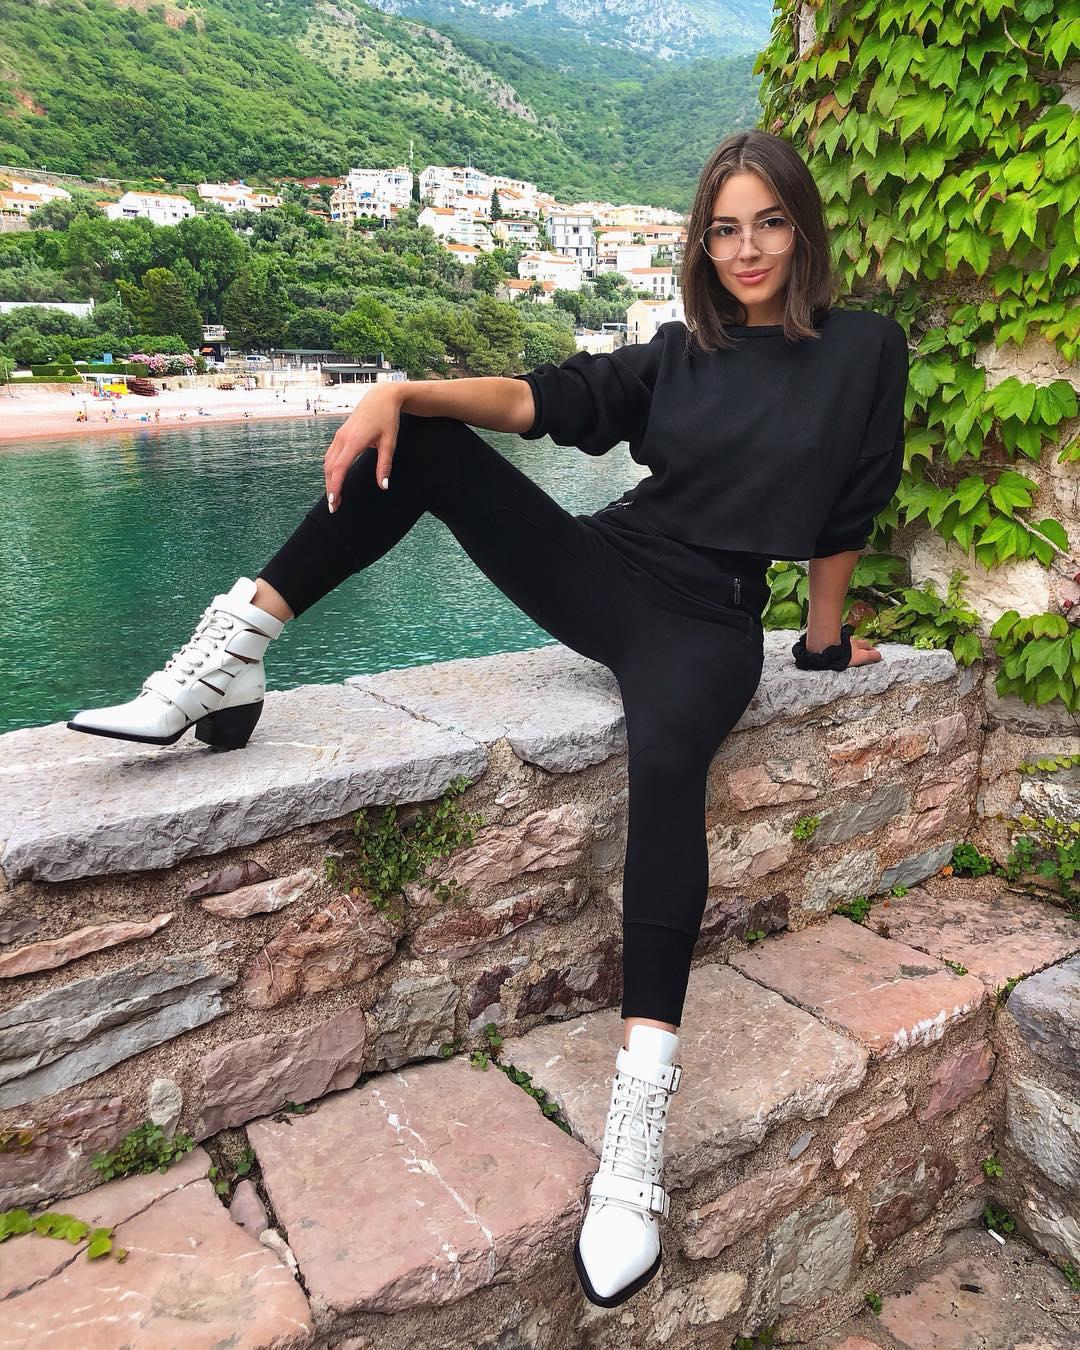 Olivia-Culpo-Wallpapers-Insta-Fit-Bio-1